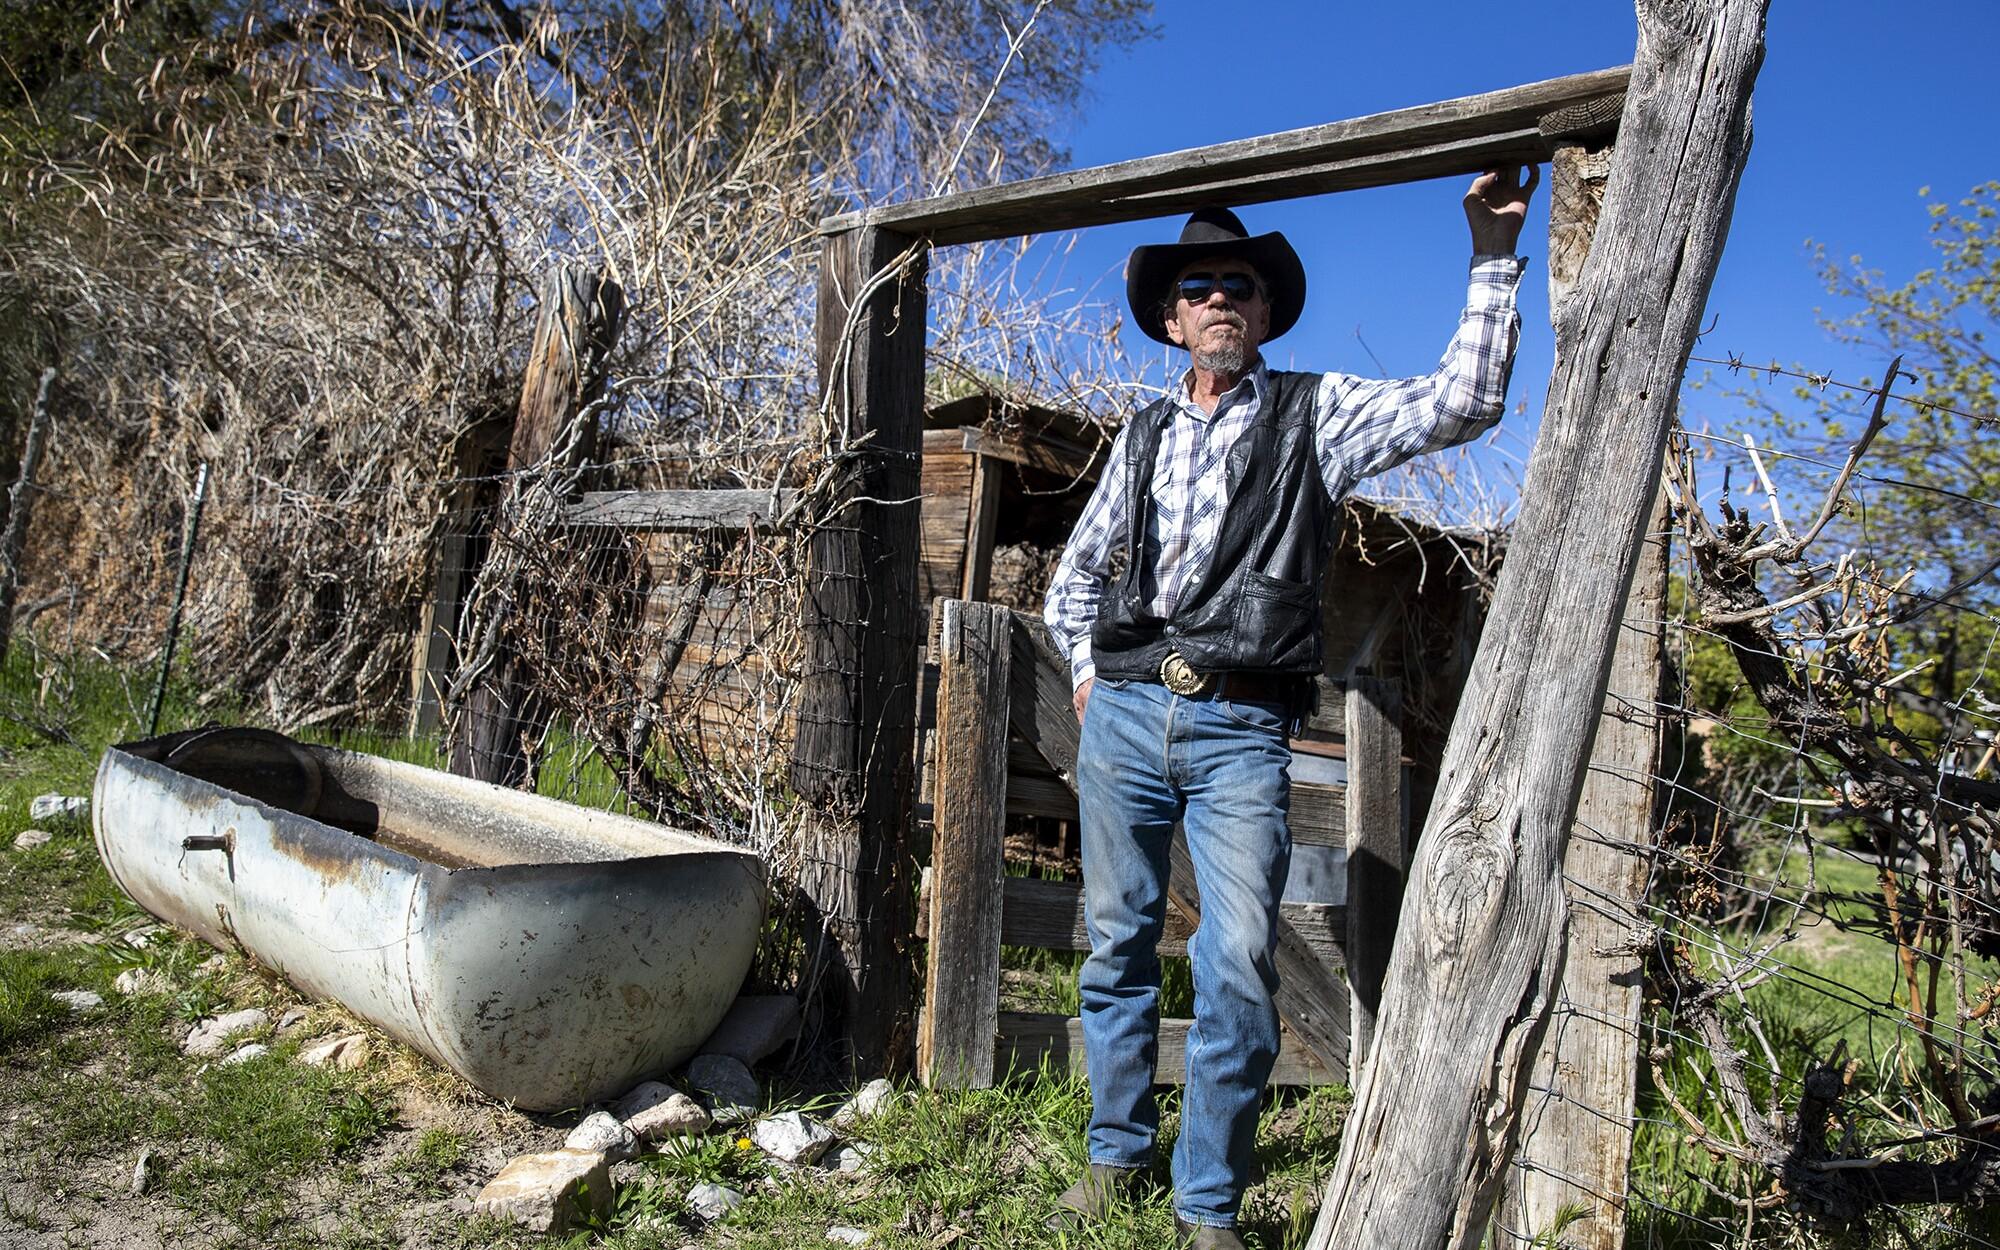 Glenndon Bundy on his rural ranch in Alamo, Nevada